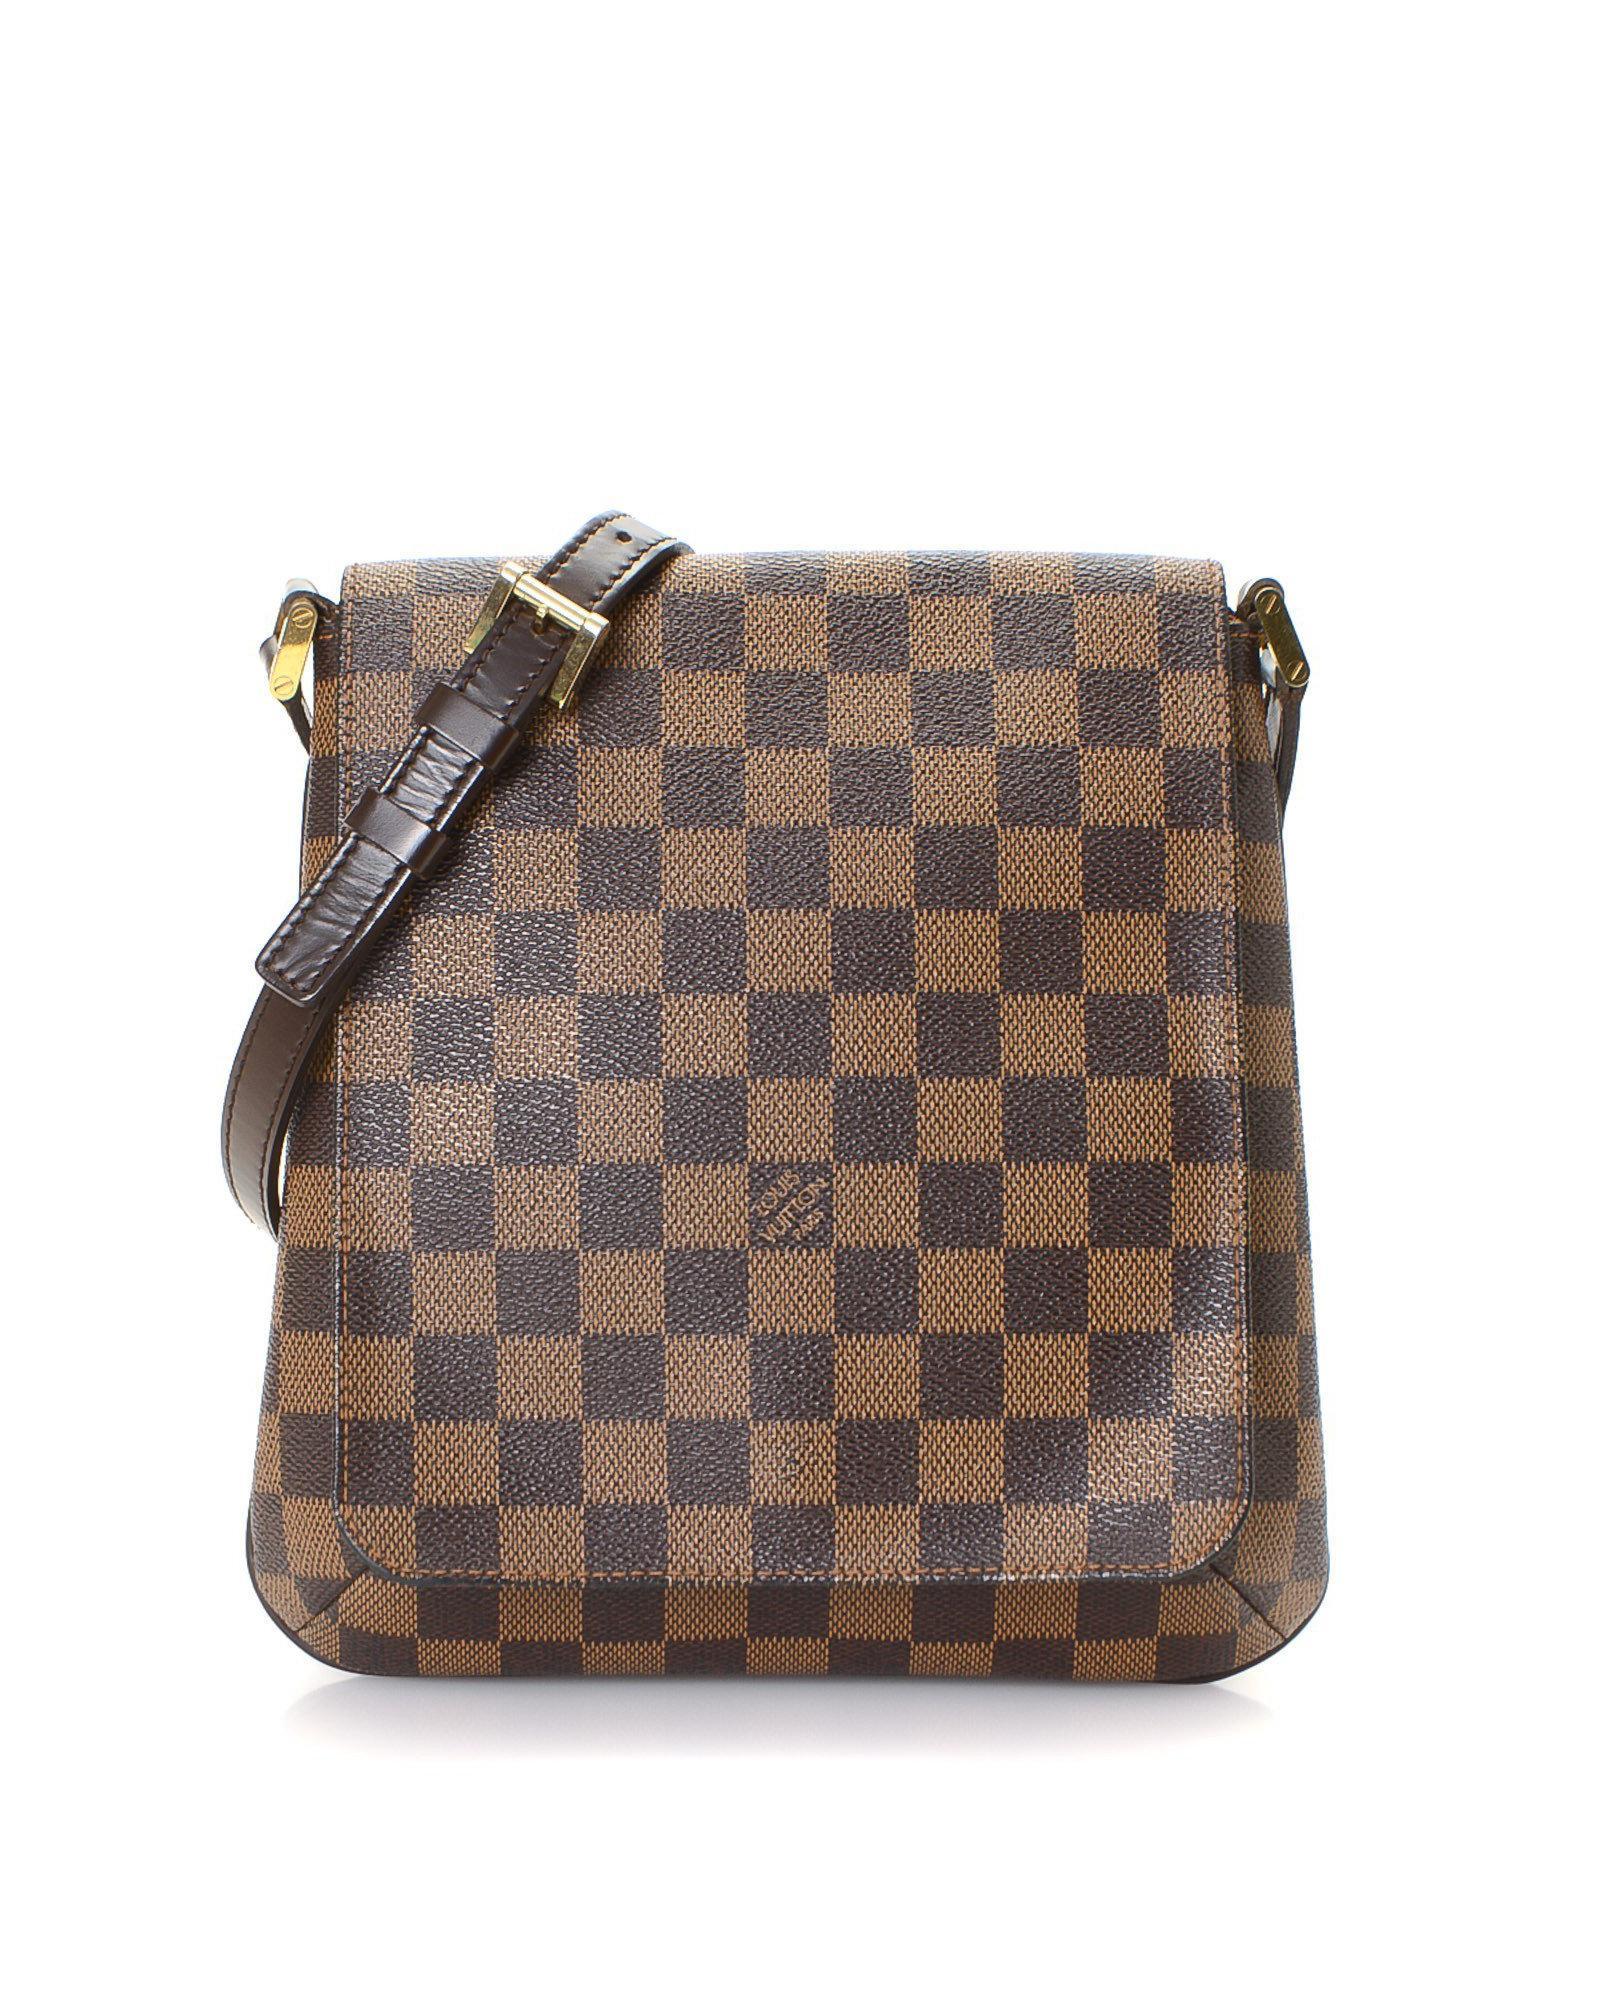 Lyst - Louis Vuitton Damier Ebene Musette Salsa Long Strap Crossbody ... 0701222a27